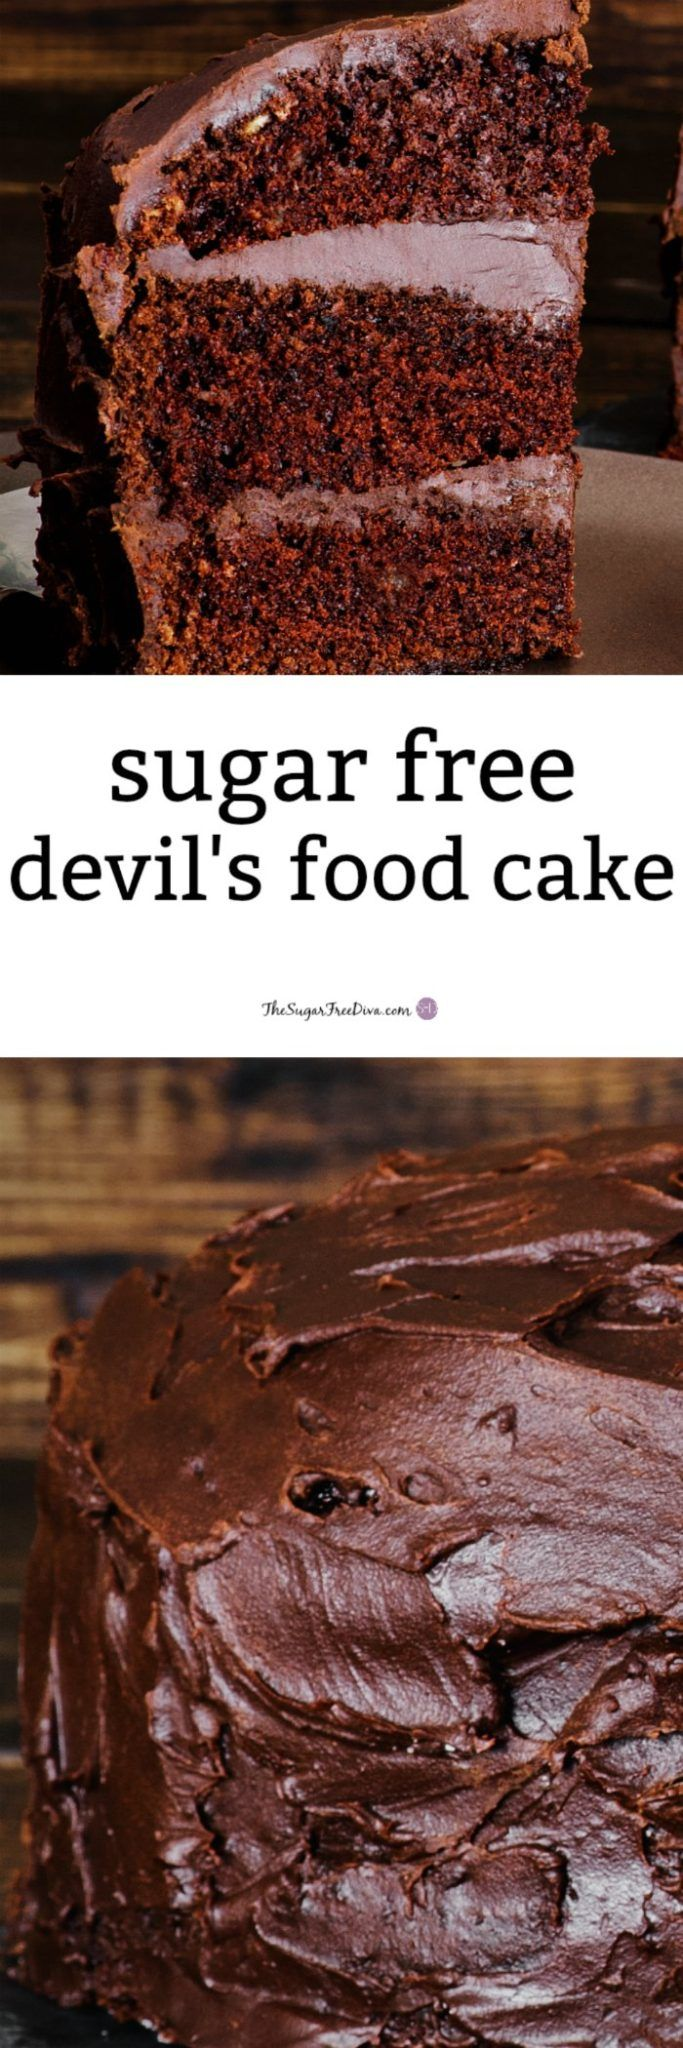 Sugar Free Devil's Good Cake